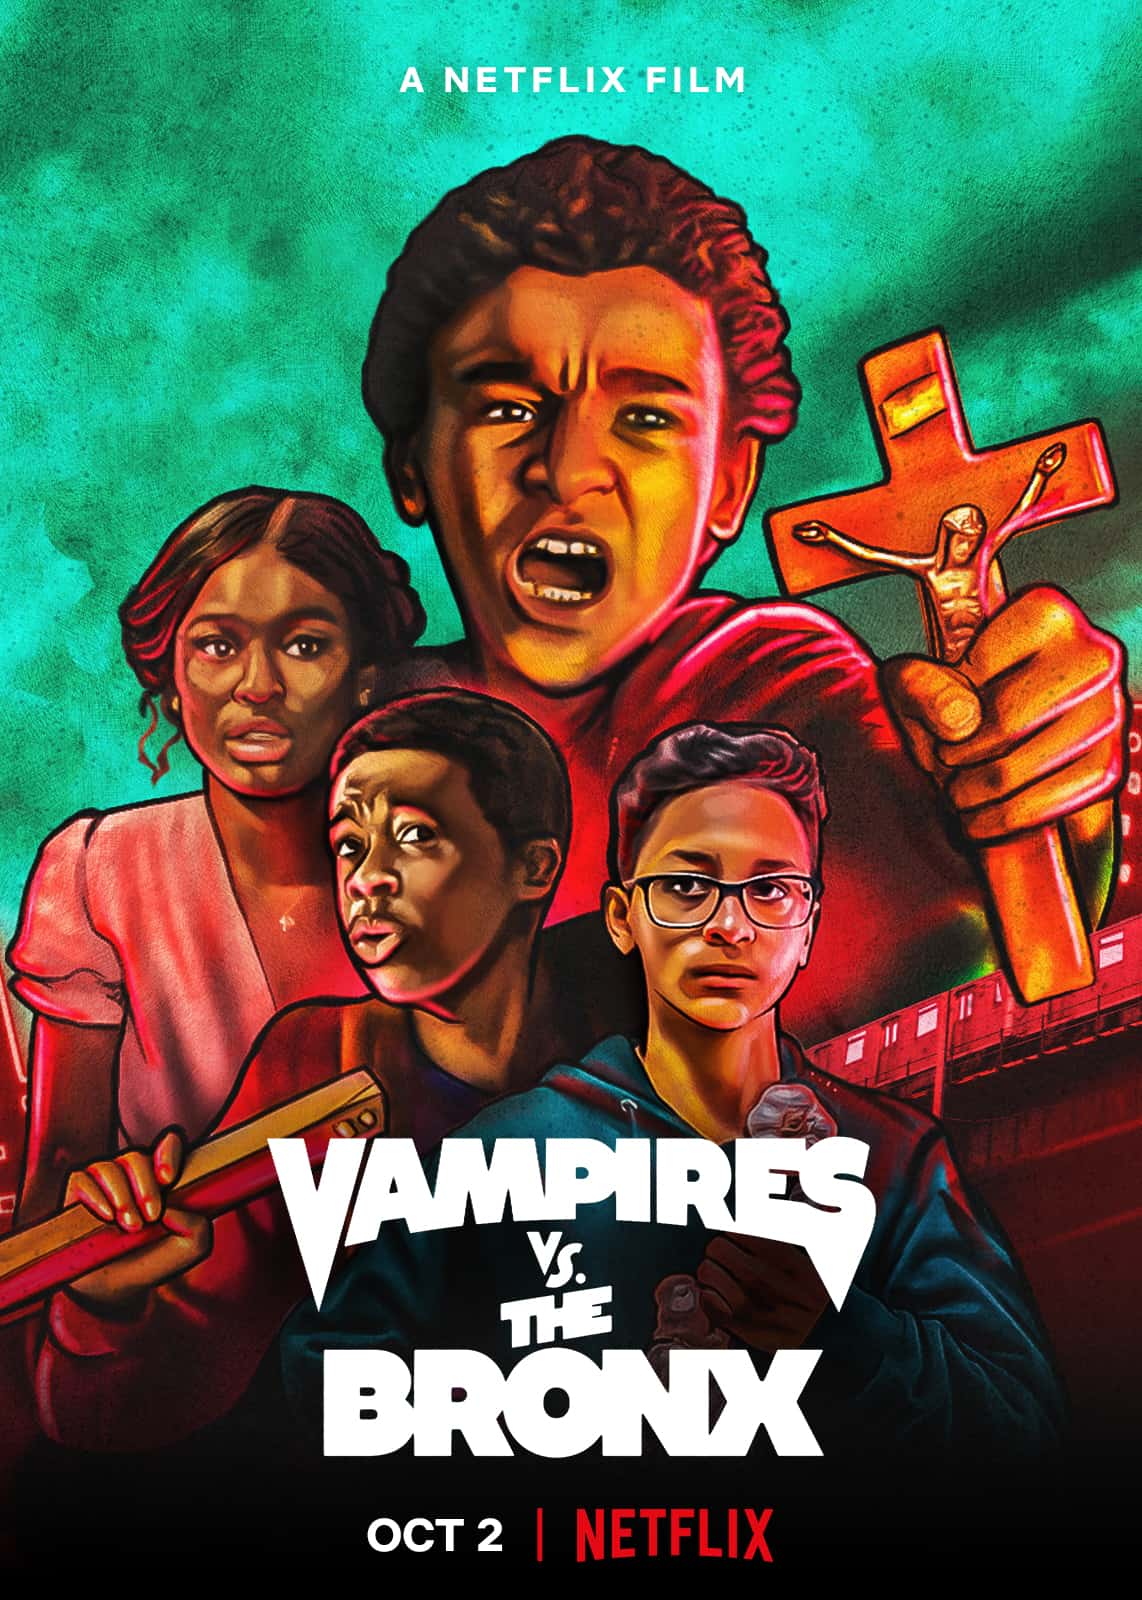 Mike's Review: Vampires vs. The Bronx (2020)